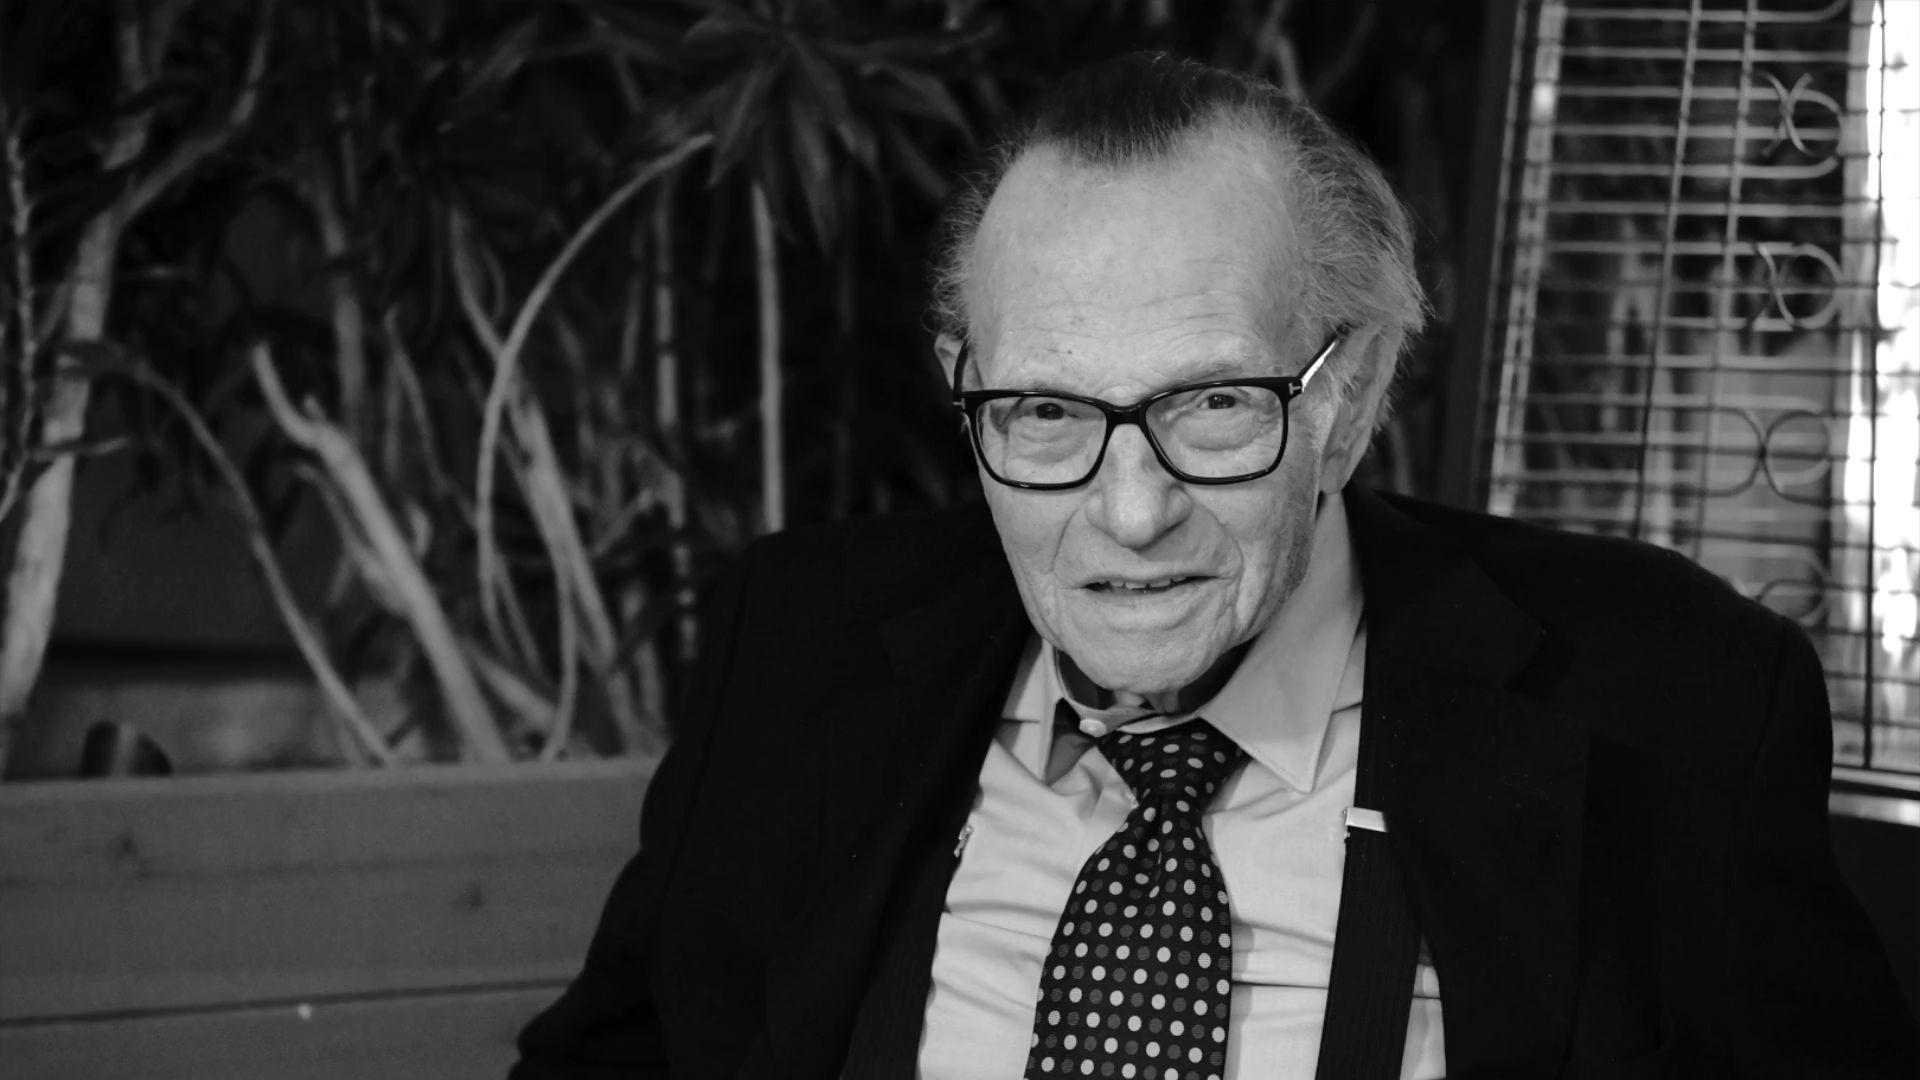 Talkmaster-Legende Larry King ist tot